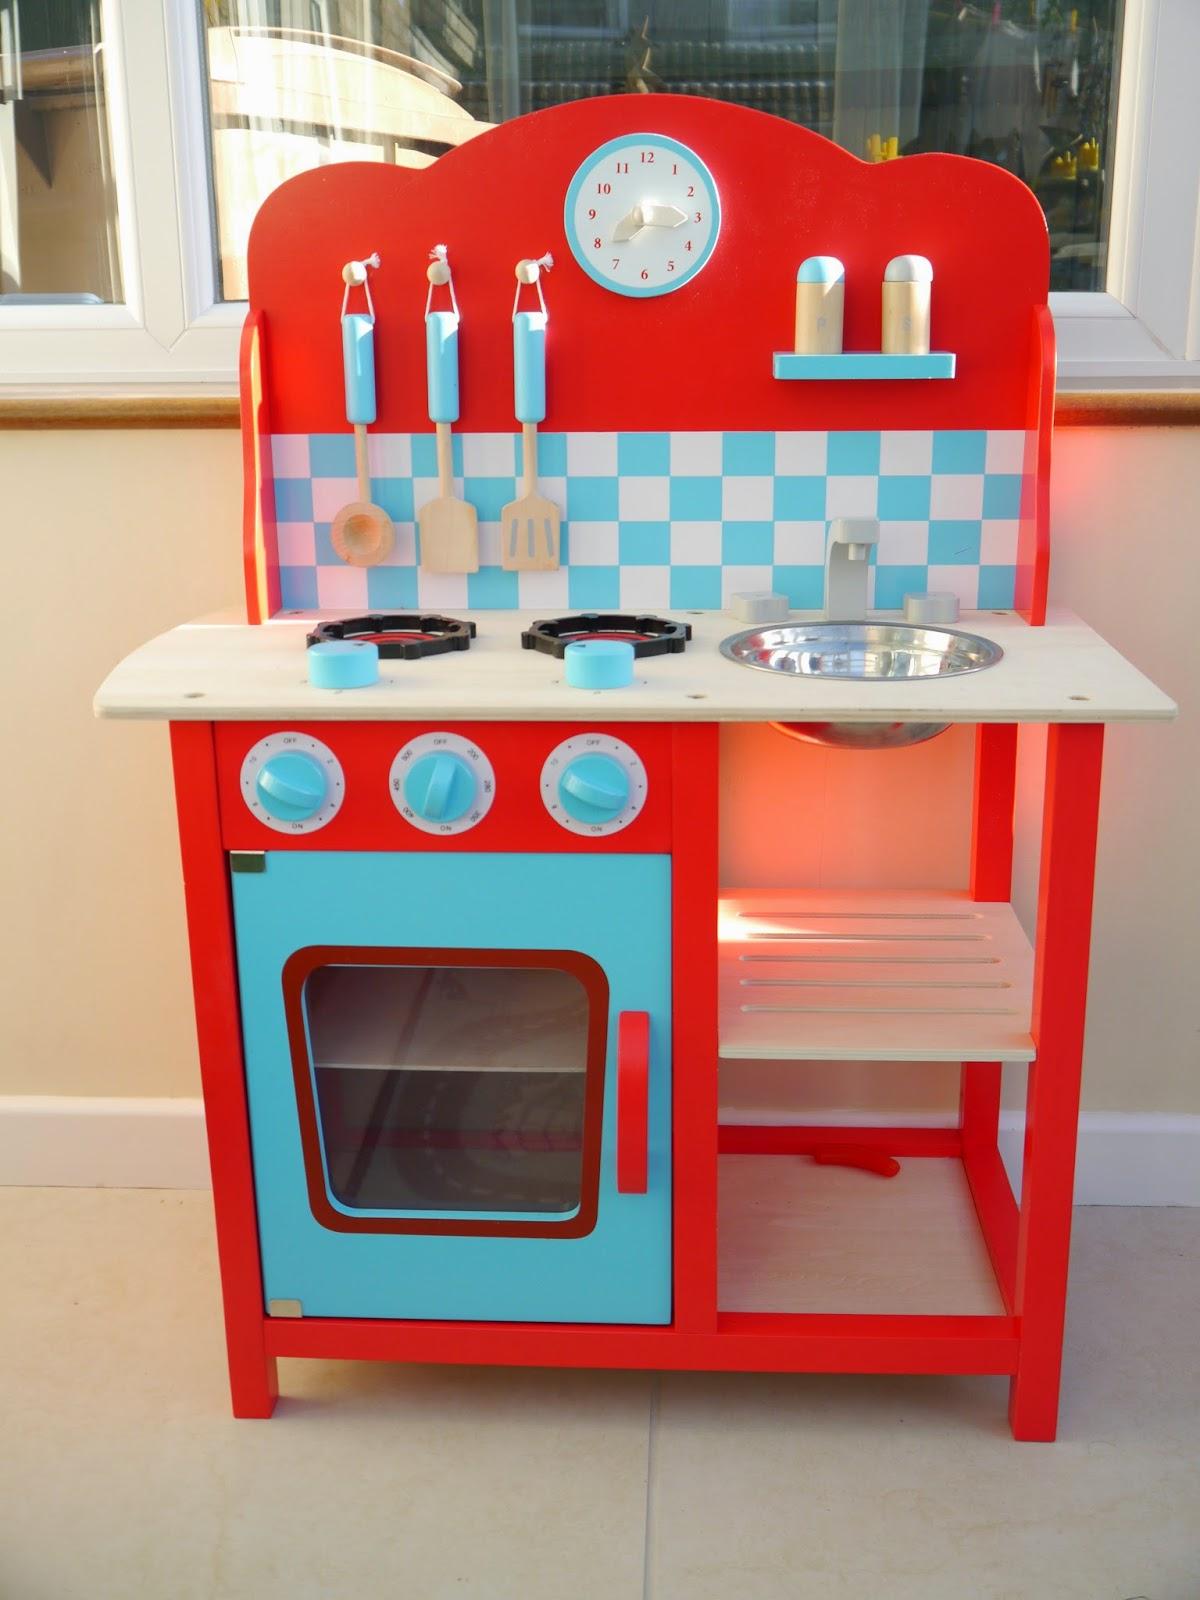 handbags to change bags gltc cavendish wooden play kitchen. Black Bedroom Furniture Sets. Home Design Ideas